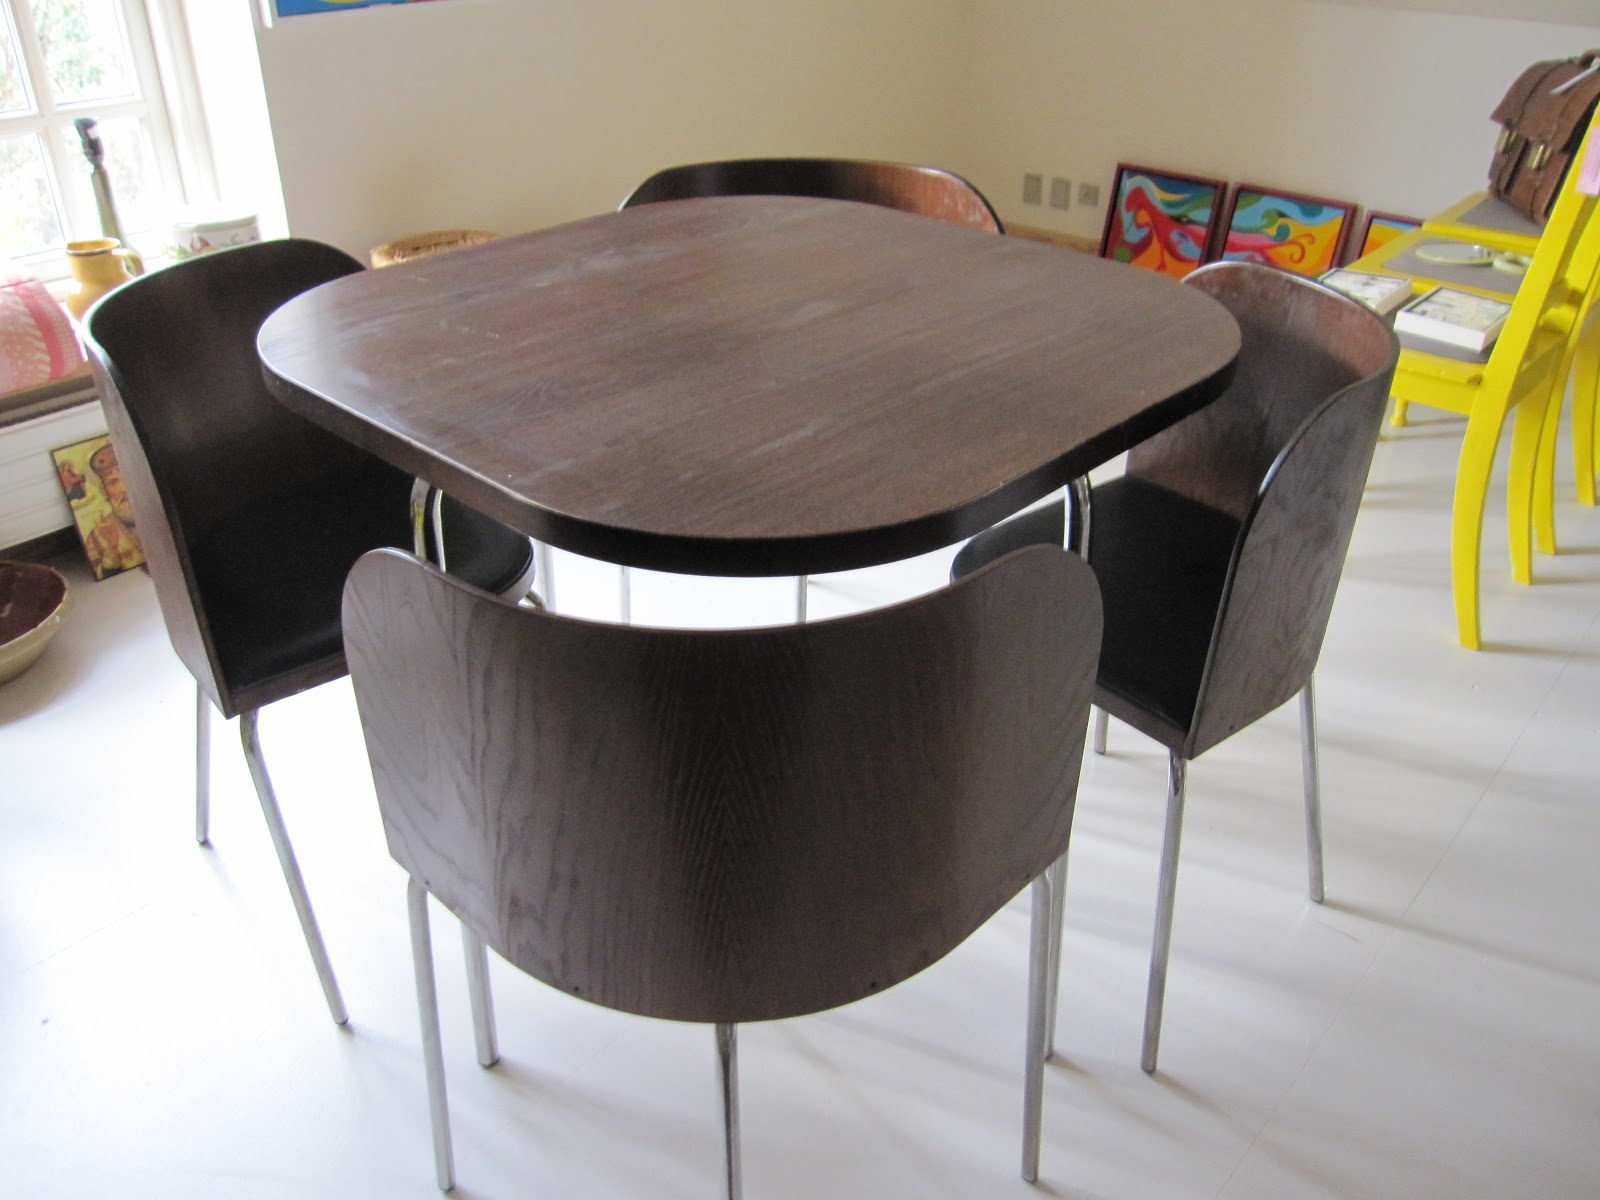 spisebord m stole Fantast fabrikken: Ikea spisebord med fire stole. spisebord m stole